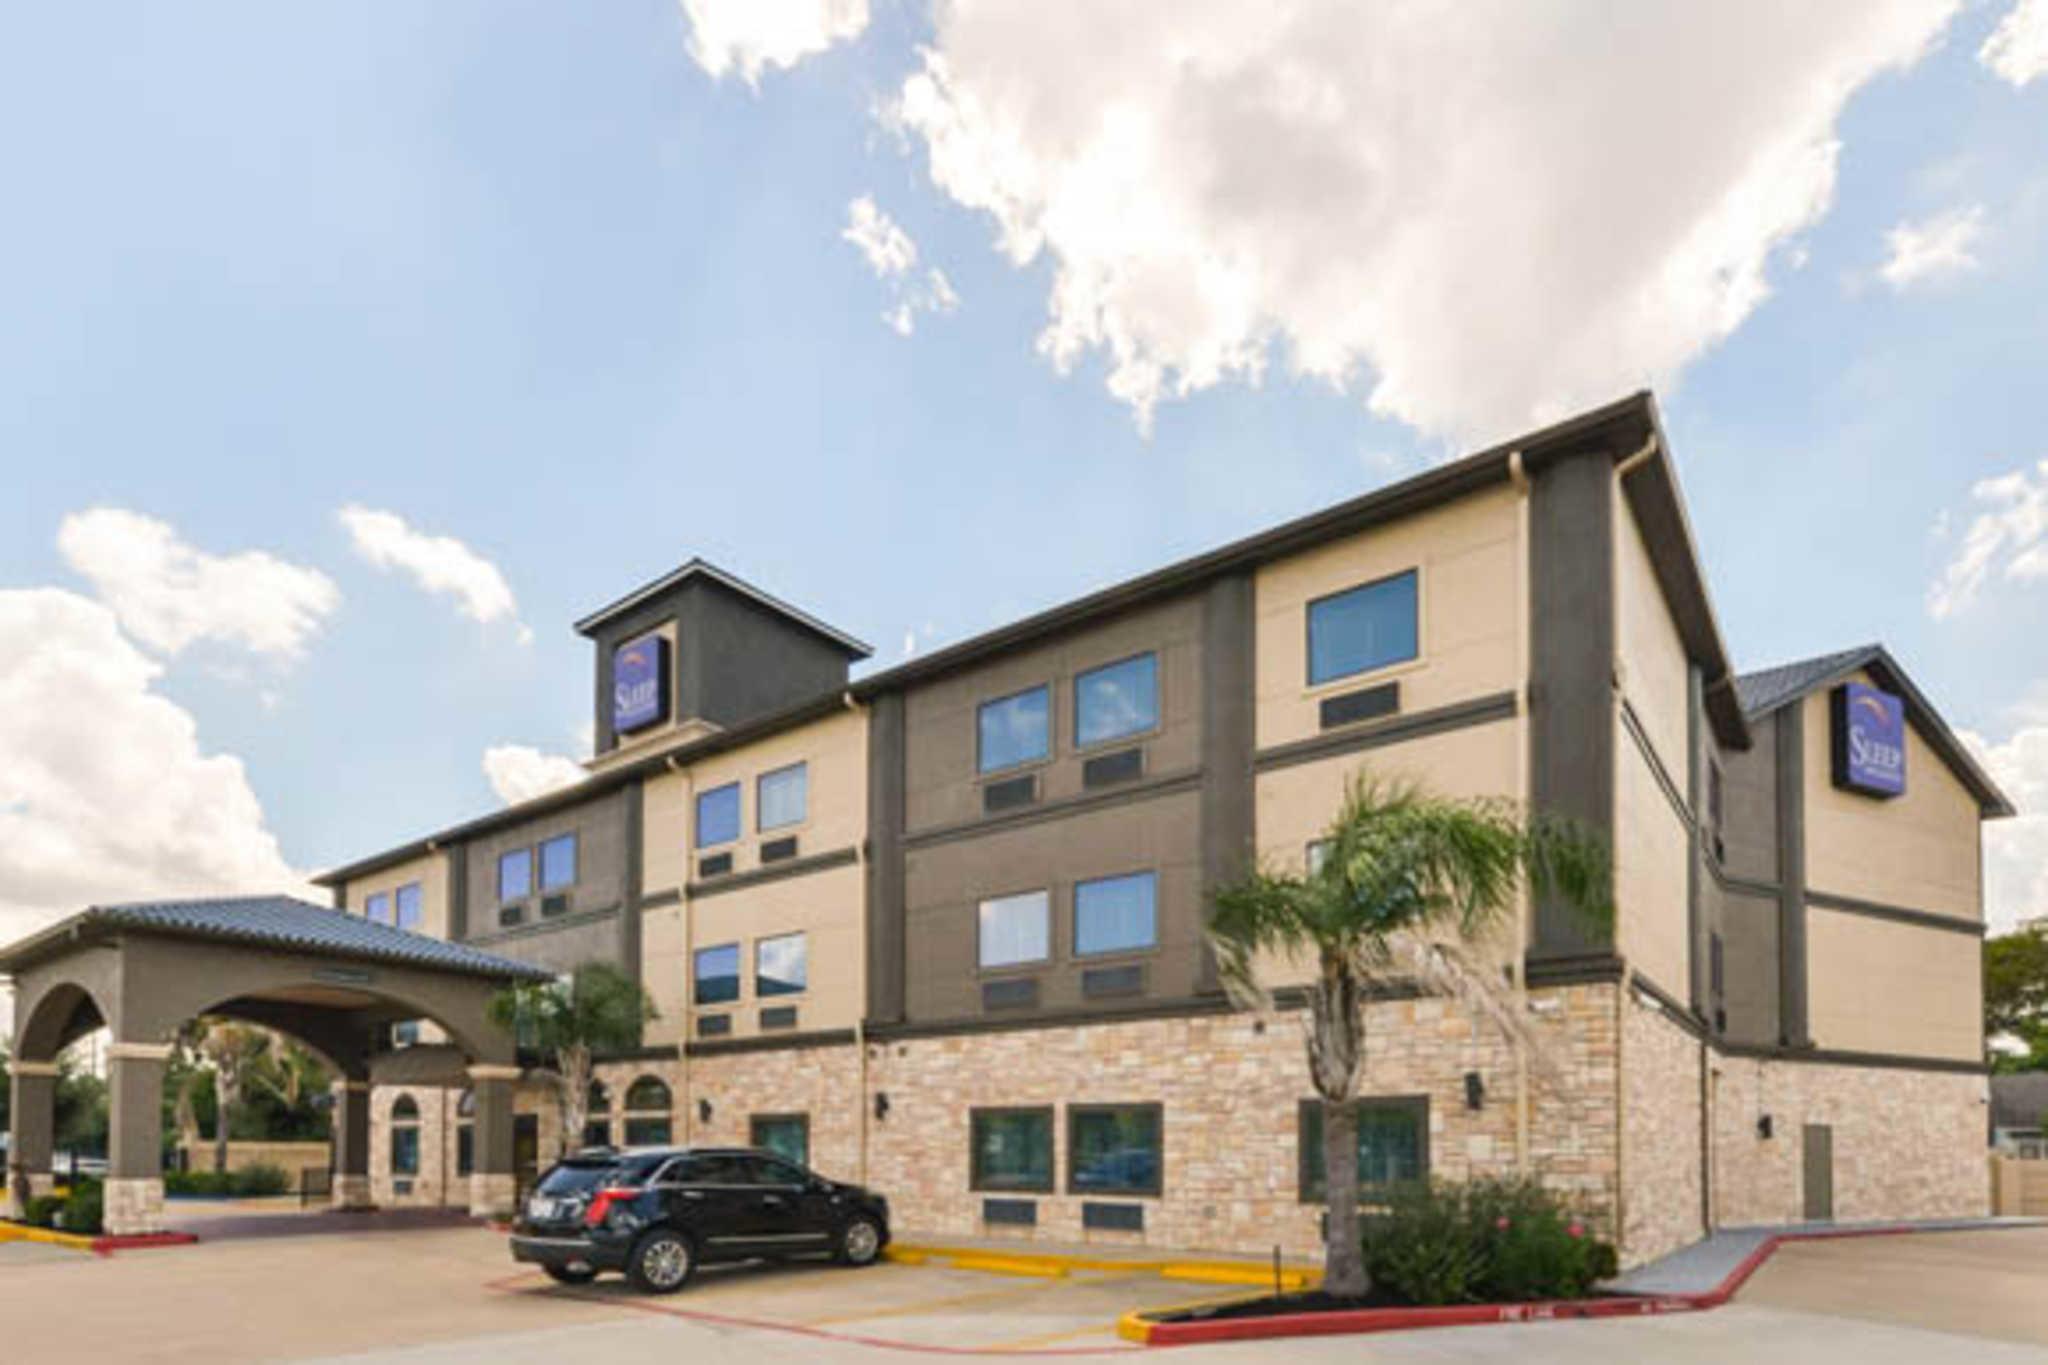 Sleep Inn & Suites Near Downtown North image 1